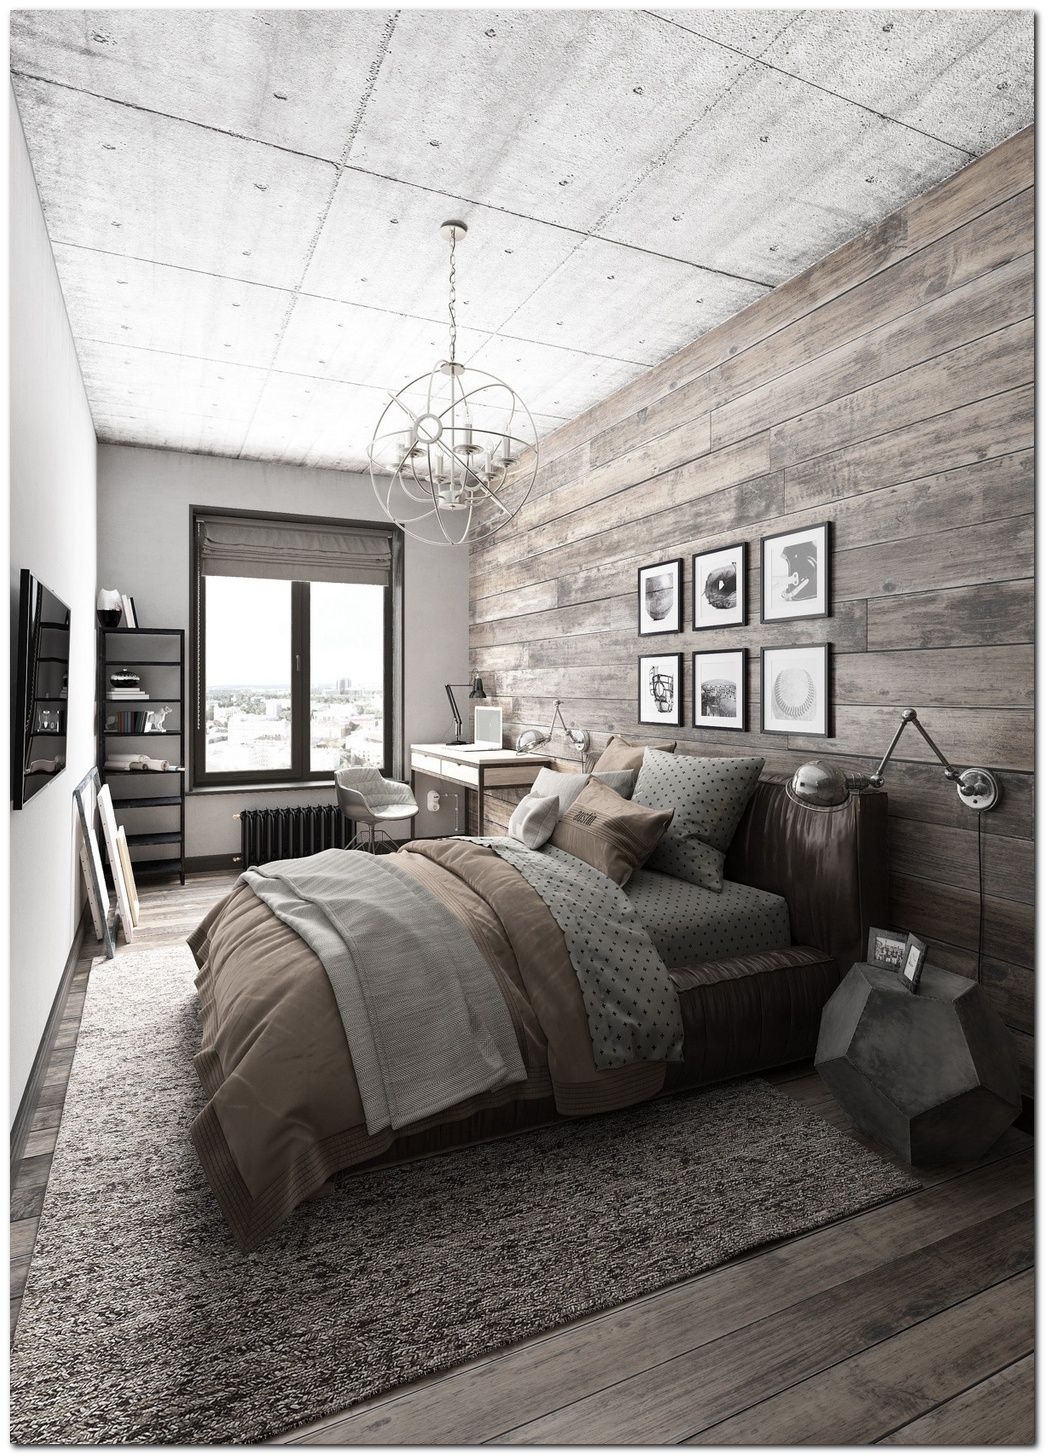 70 Ideas For Industrial Bedroom Interior The Urban Interior